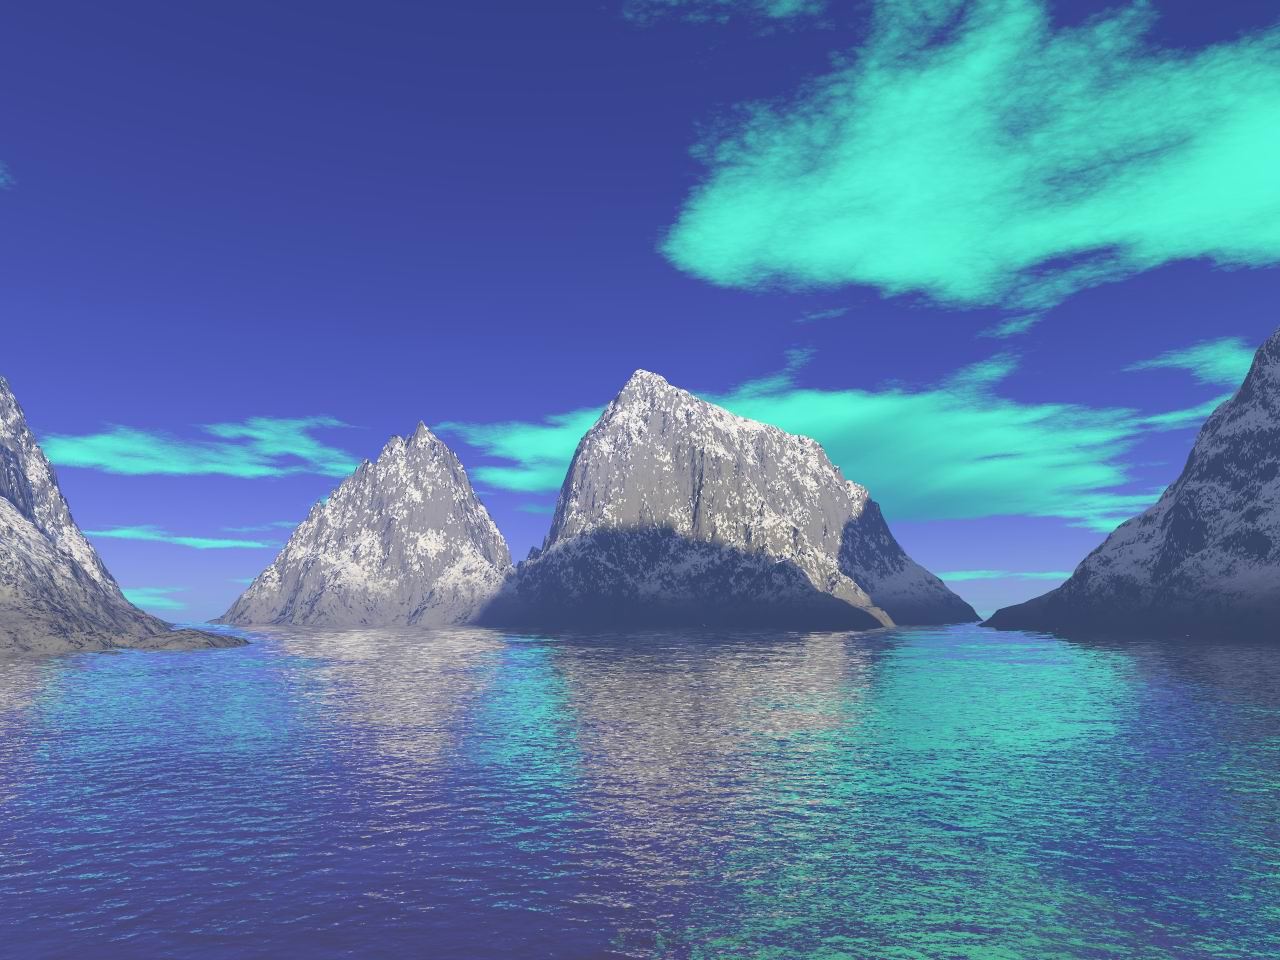 Wallpaper montagne Design Web